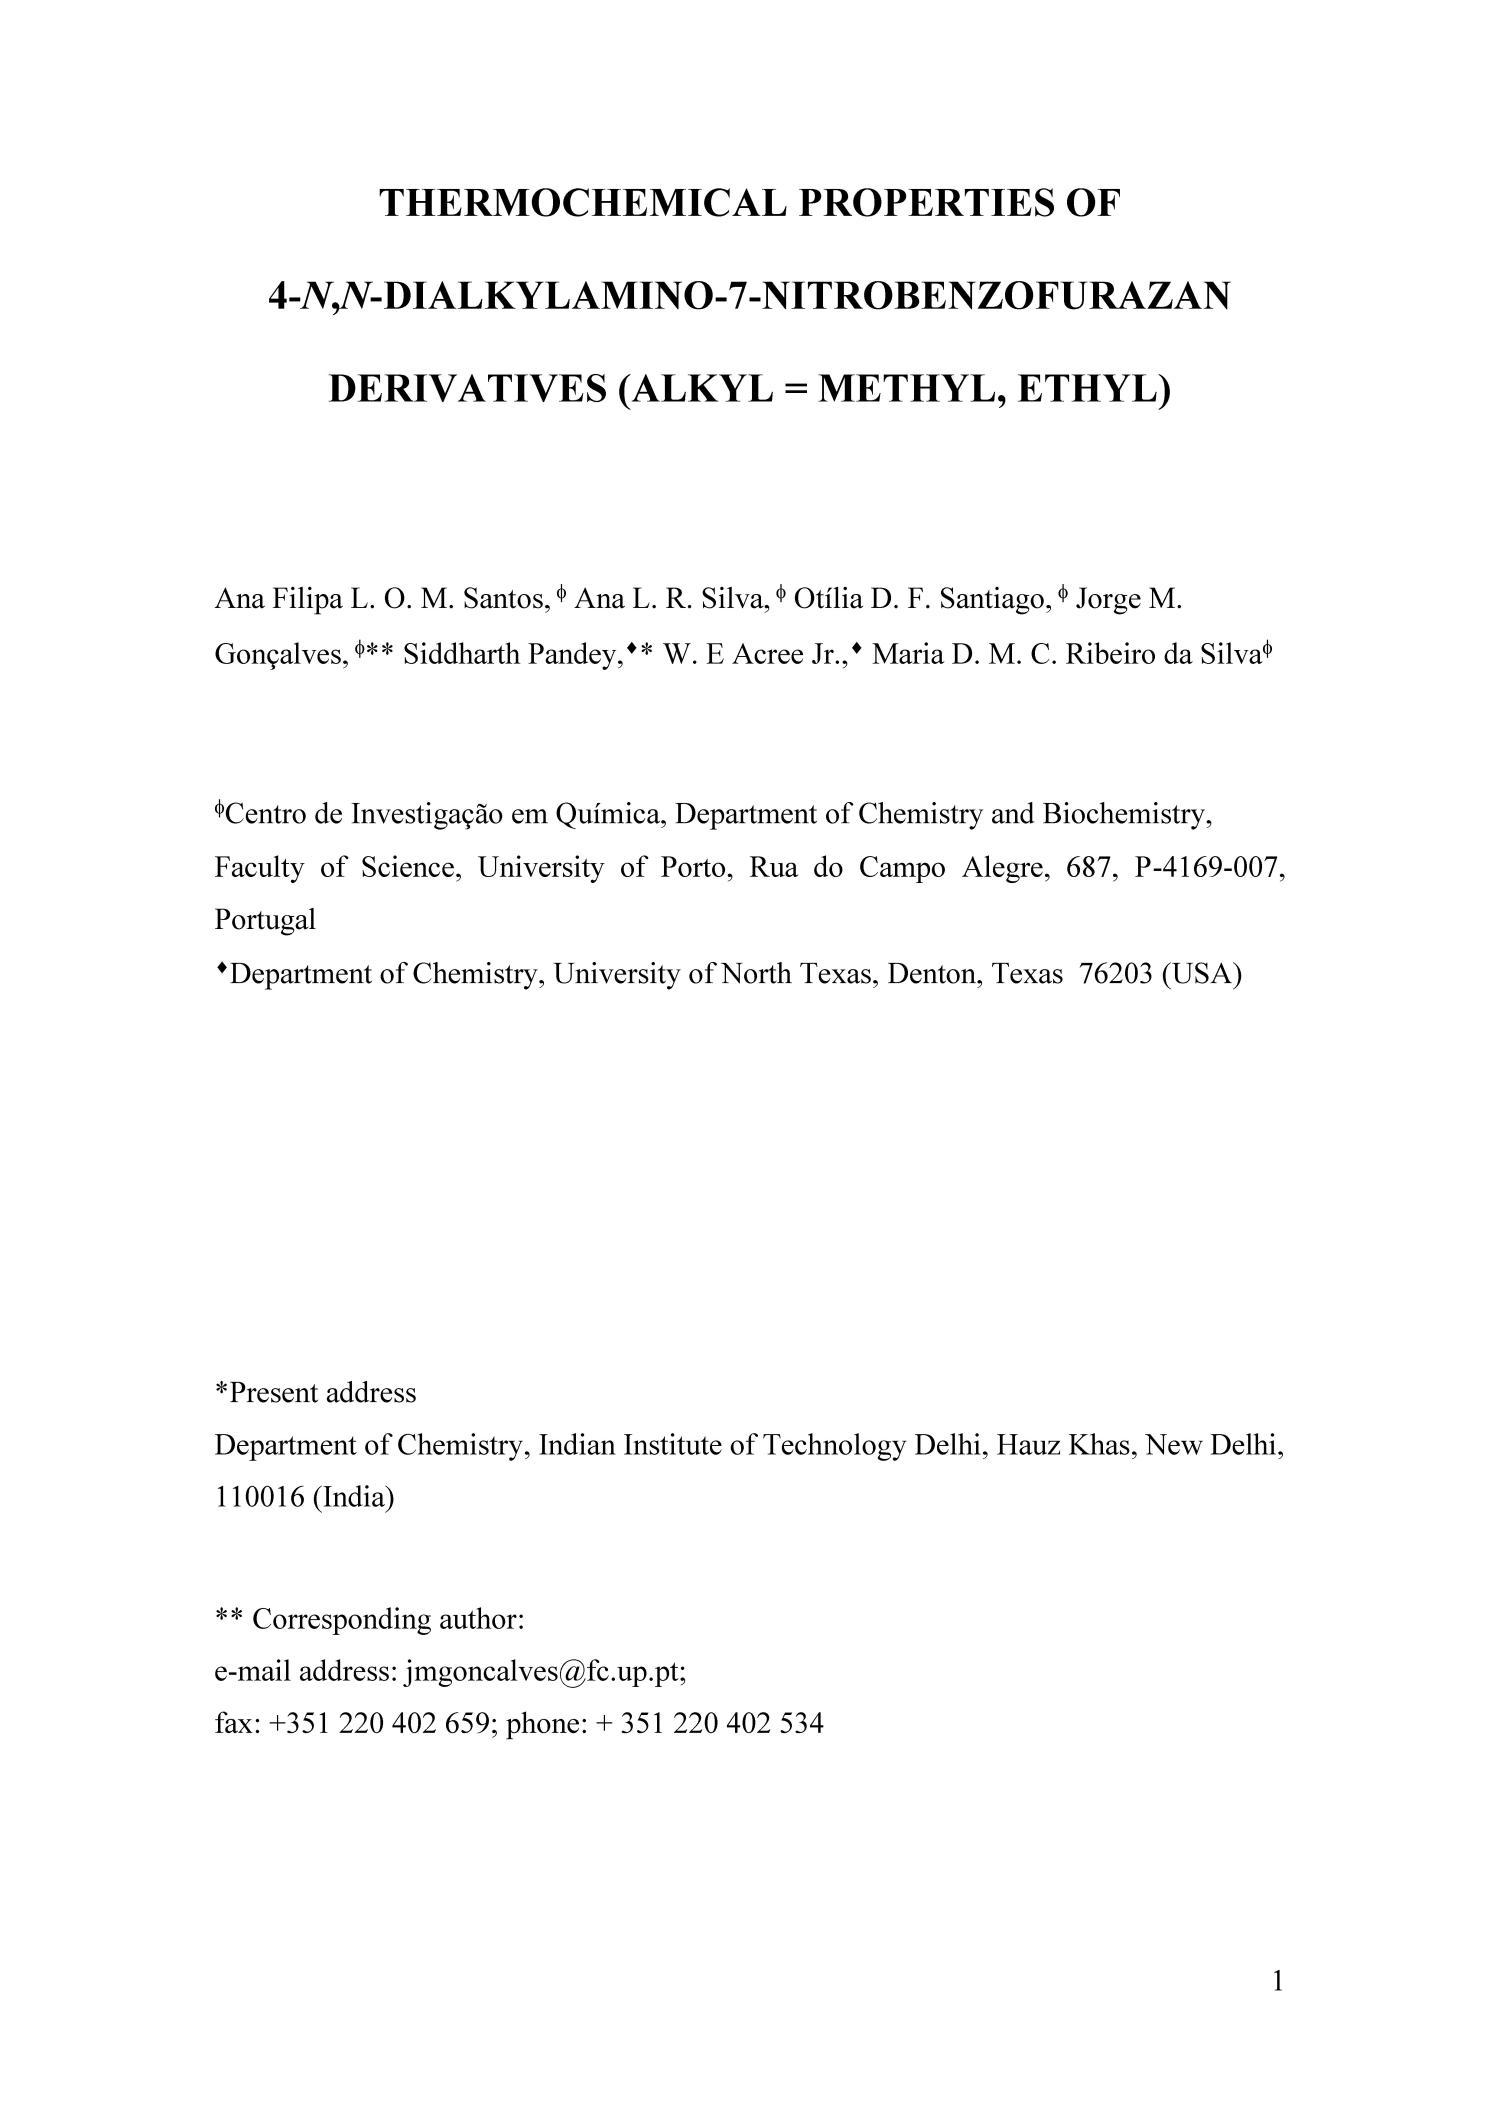 Thermochemical Properties of 4-N,N-Dialkylamino-7-Nitrobenzofurazan